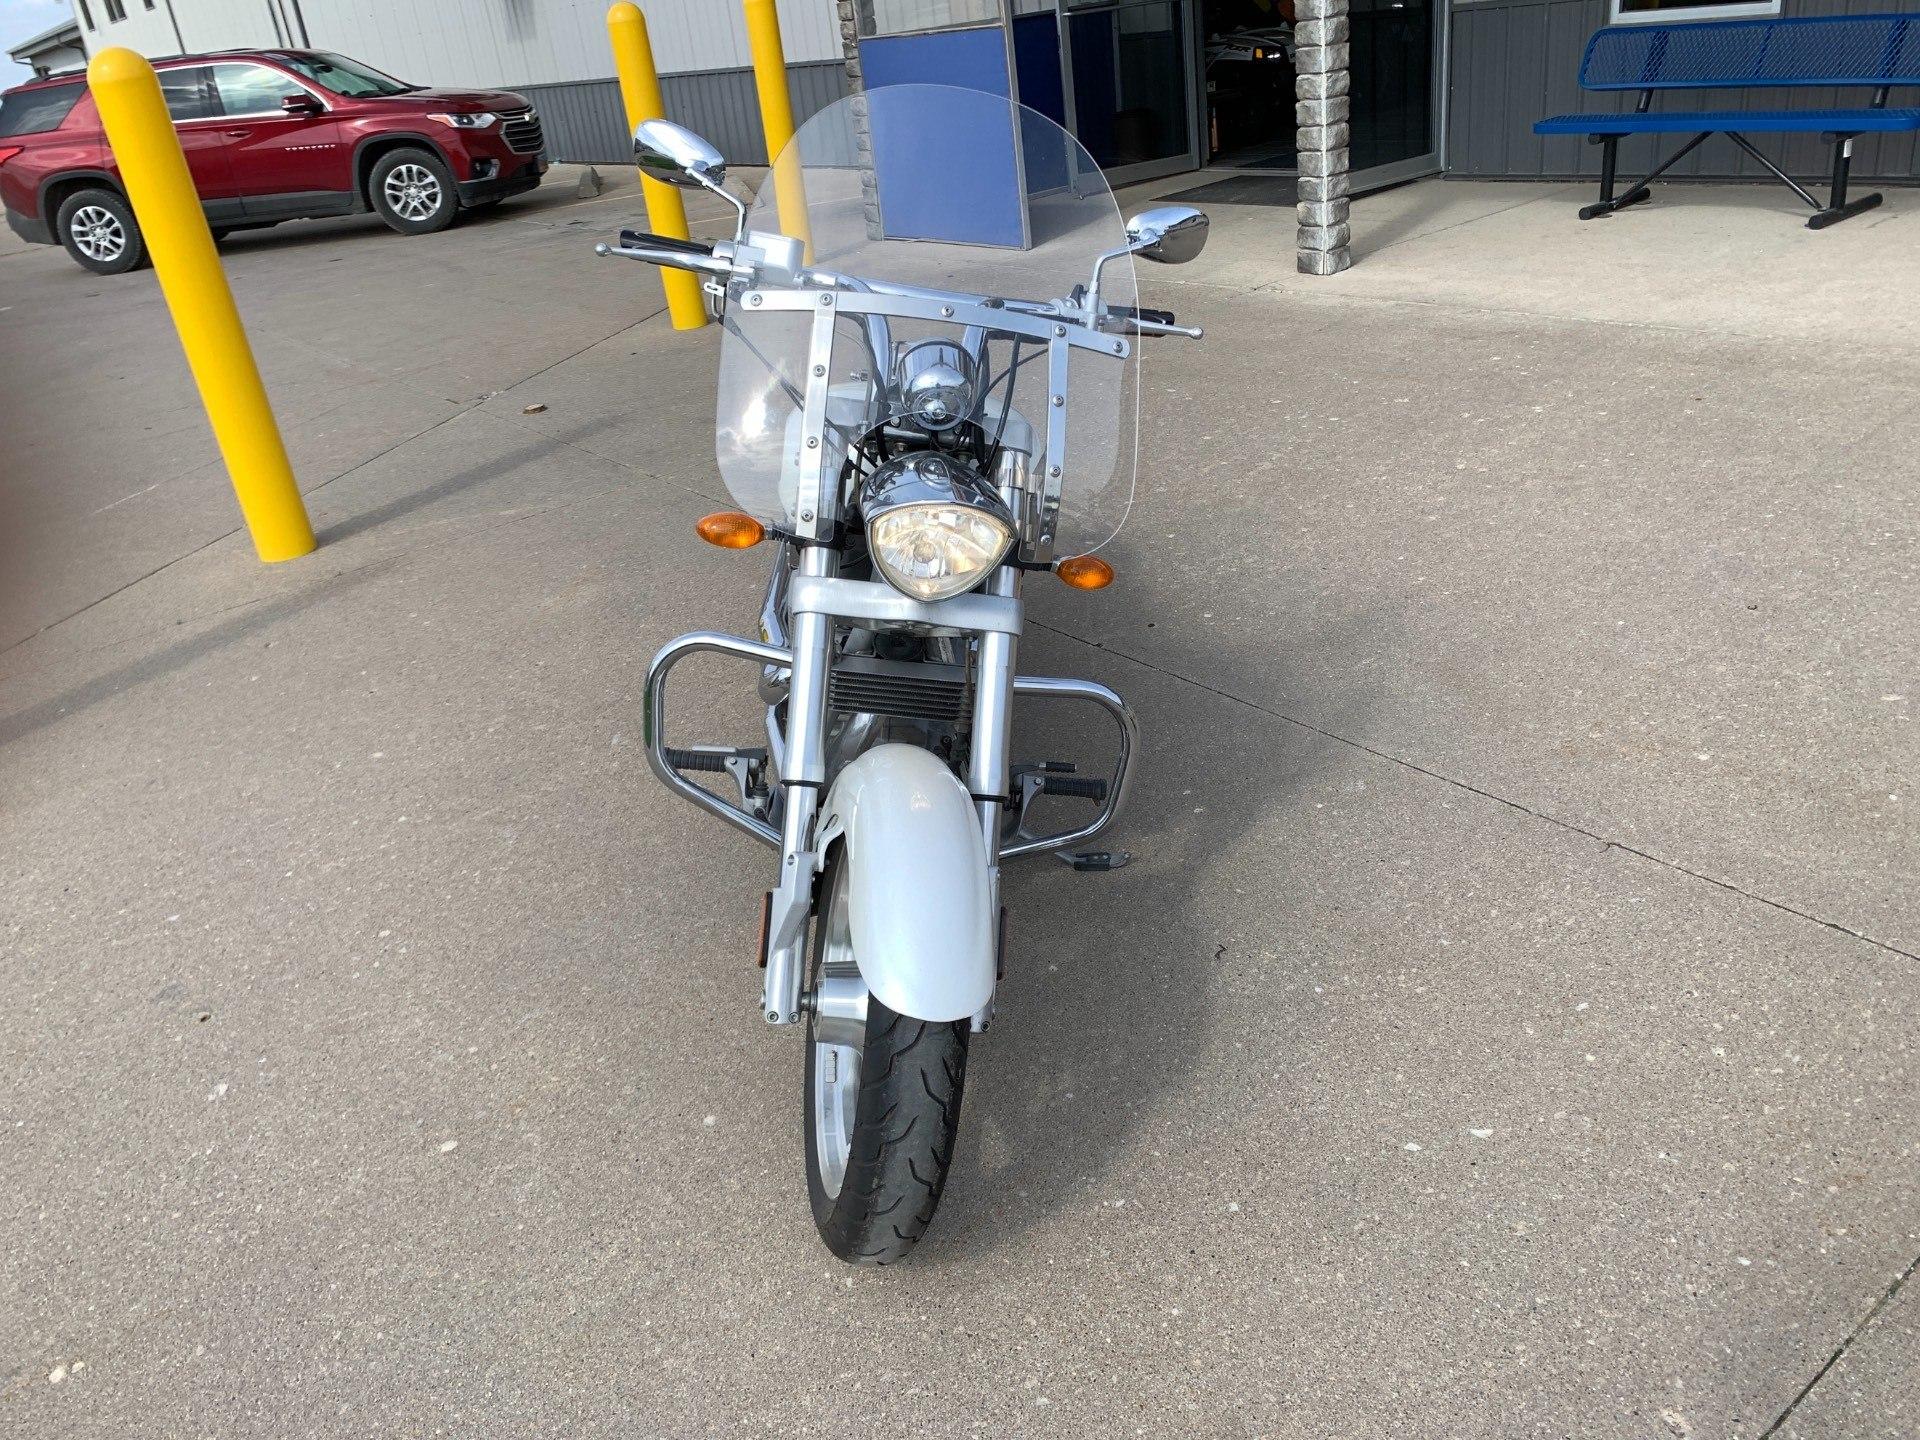 Used 2006 Victory Kingpin Motorcycles In Ottumwa  Ia